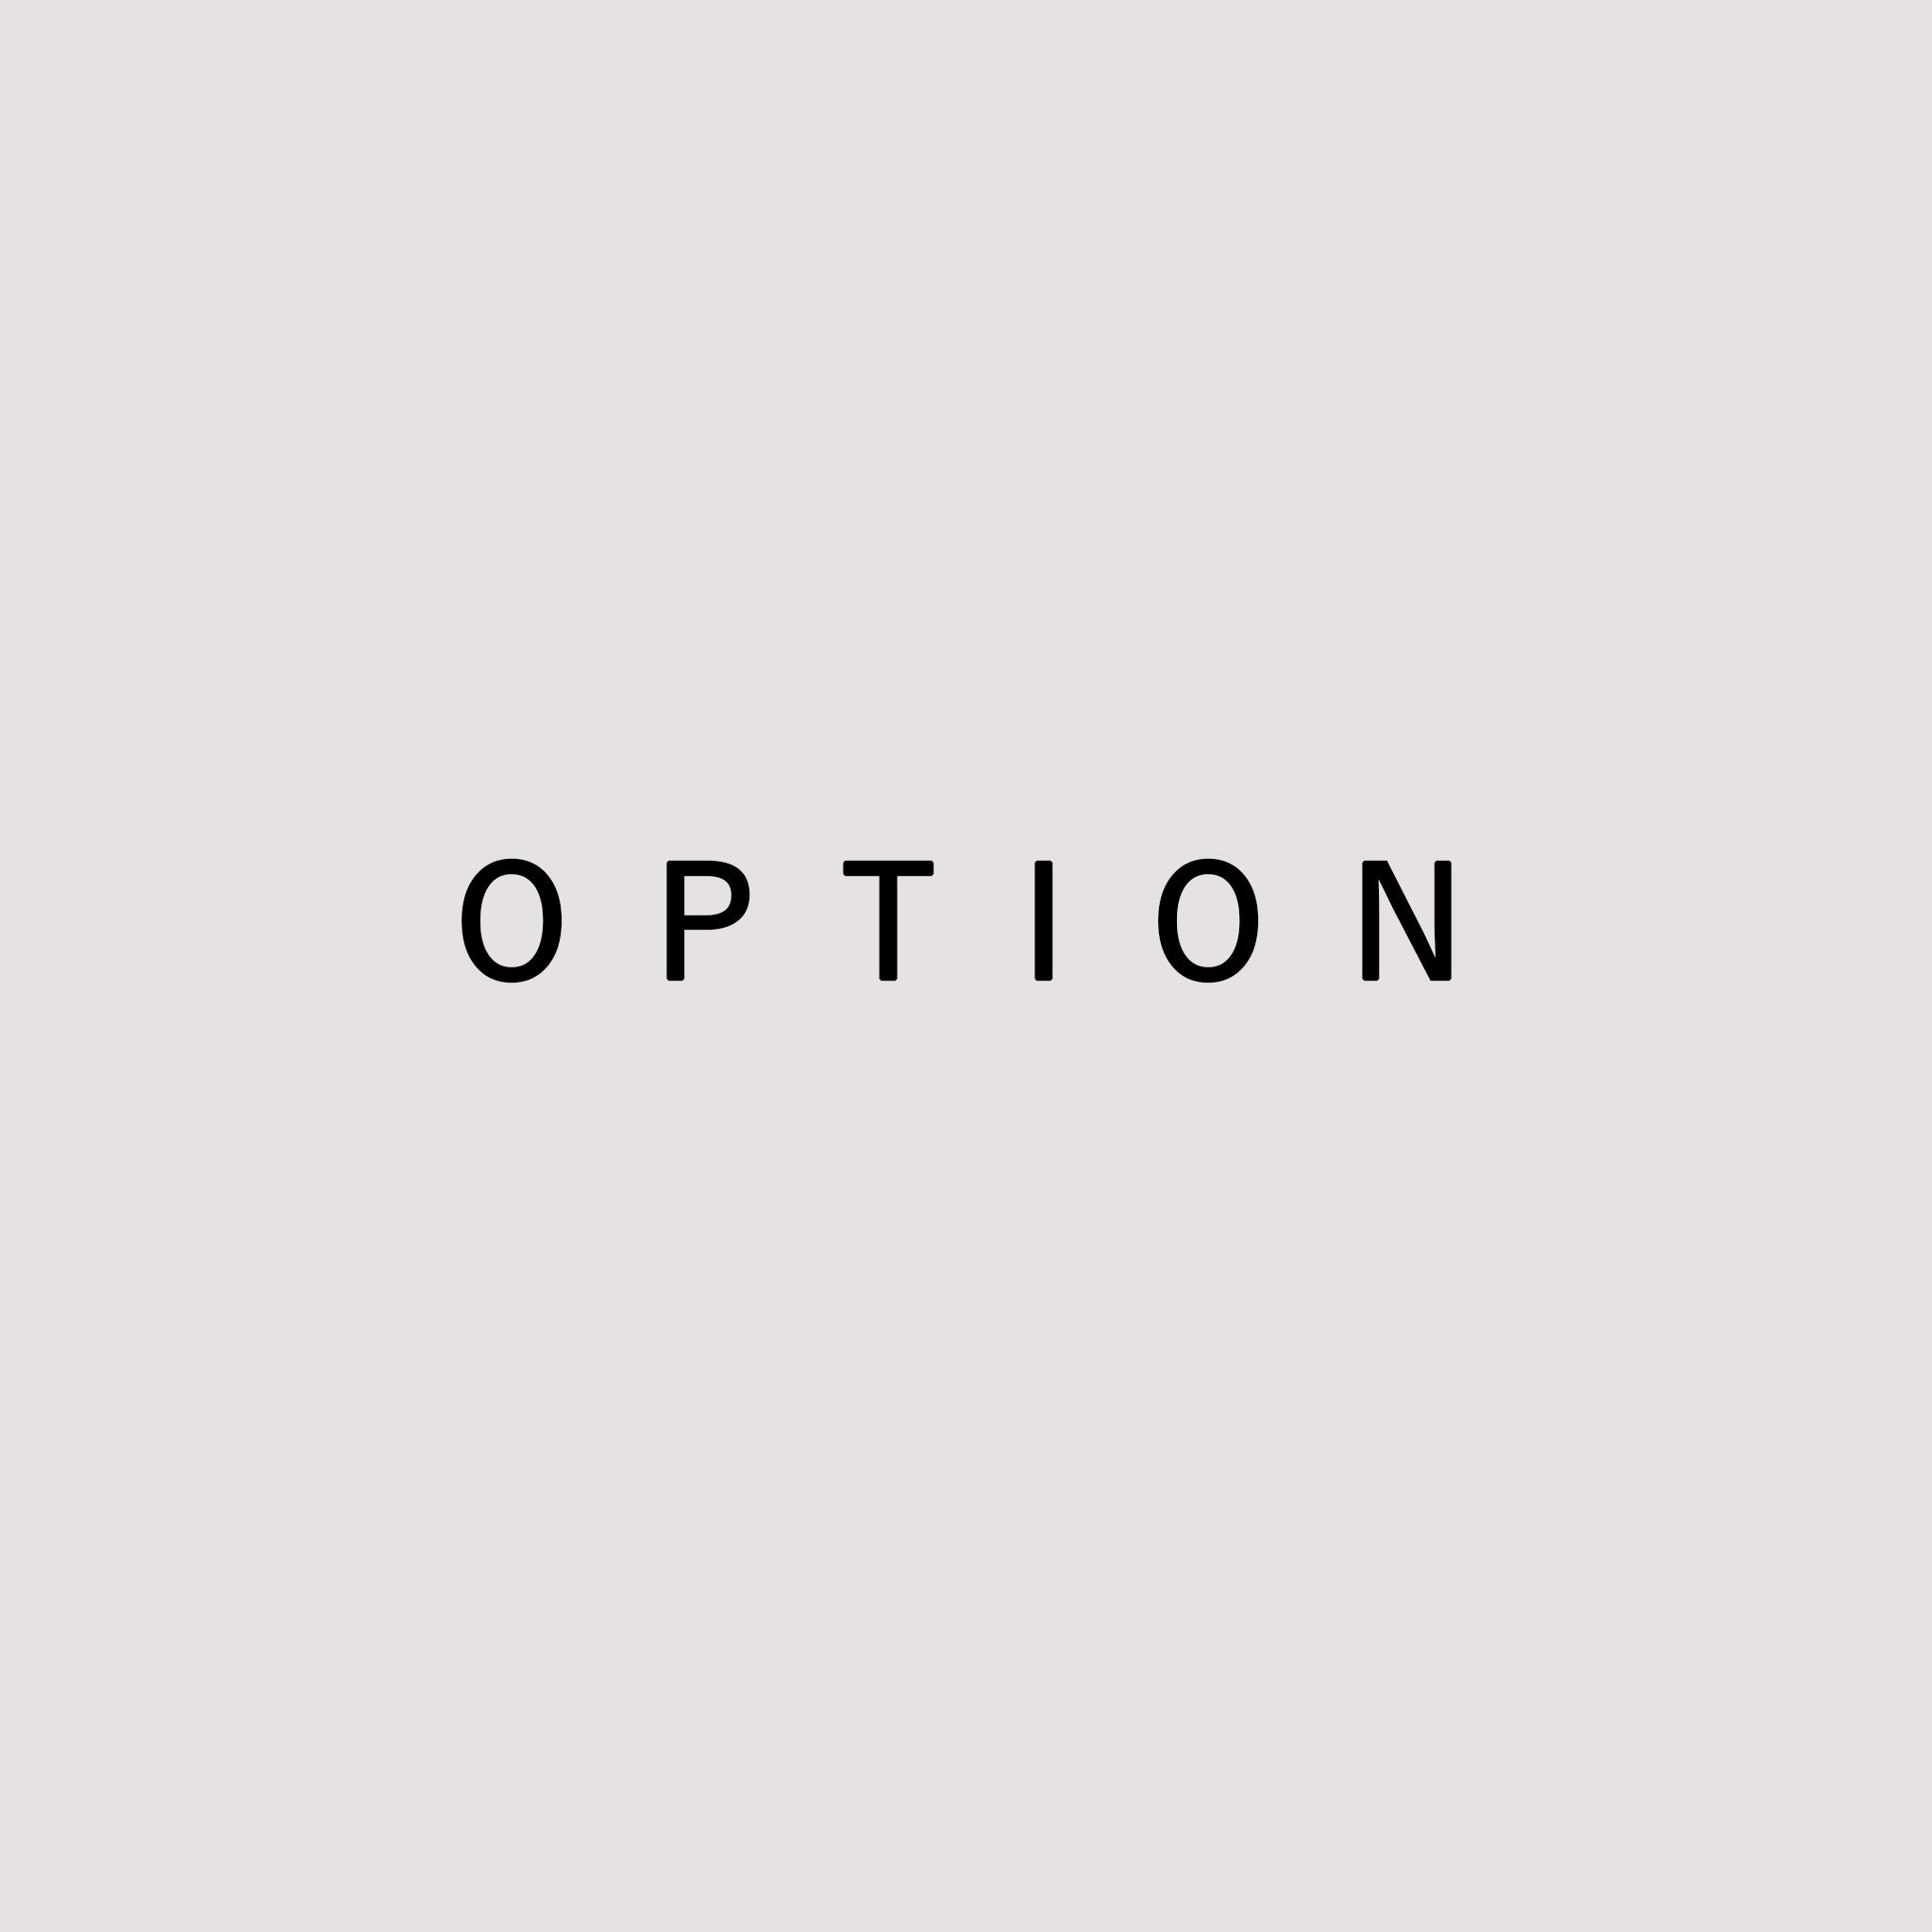 OPTION 《 1,000 yen 》